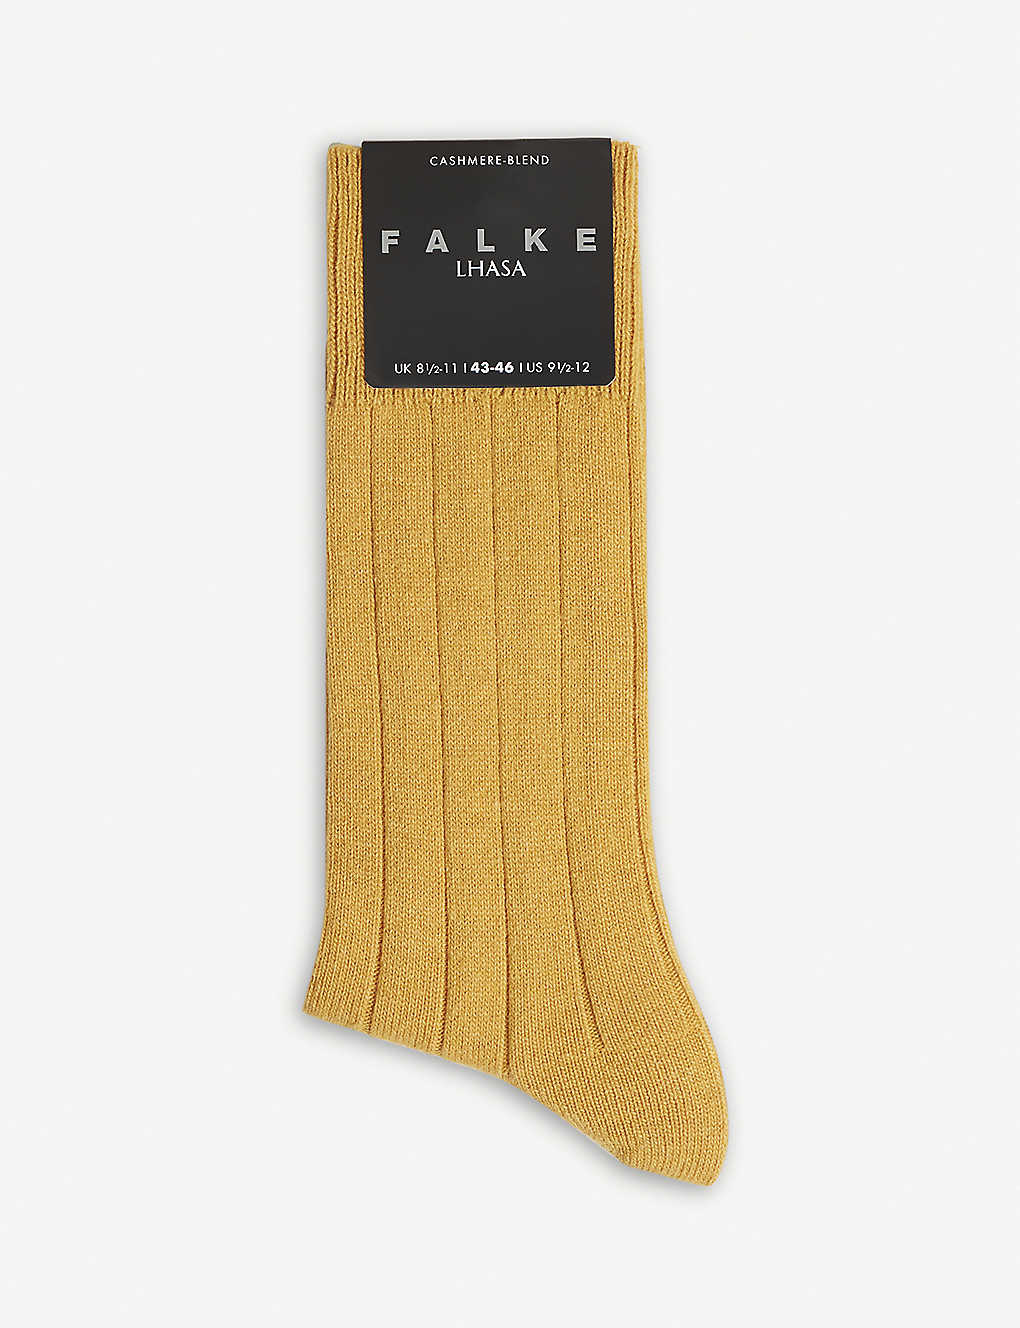 ce4aa19b1b5 FALKE - Lhasa wool-cashmere socks